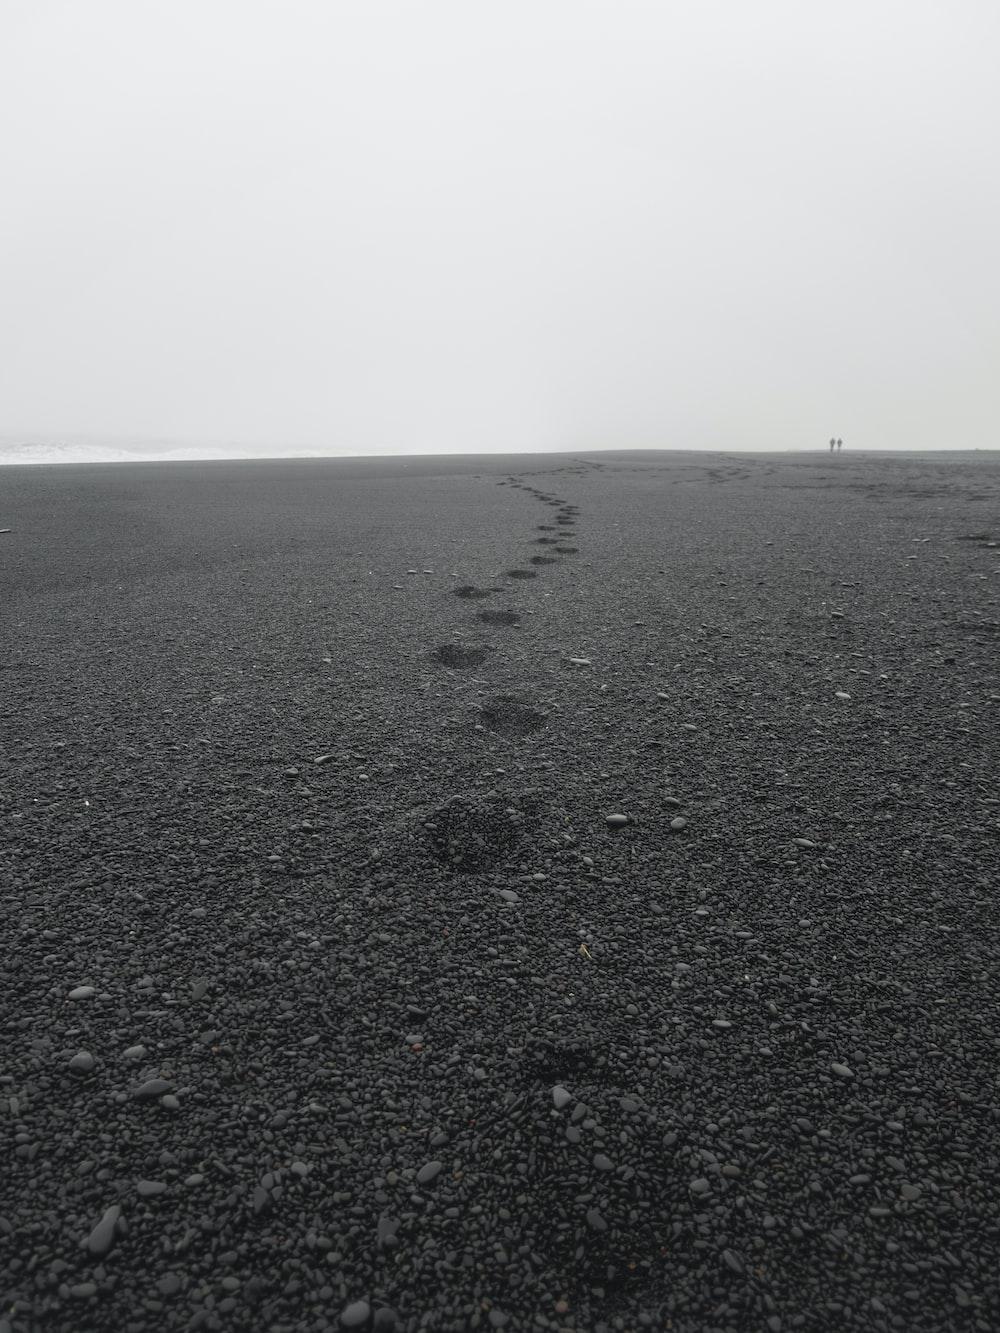 black sand and stones